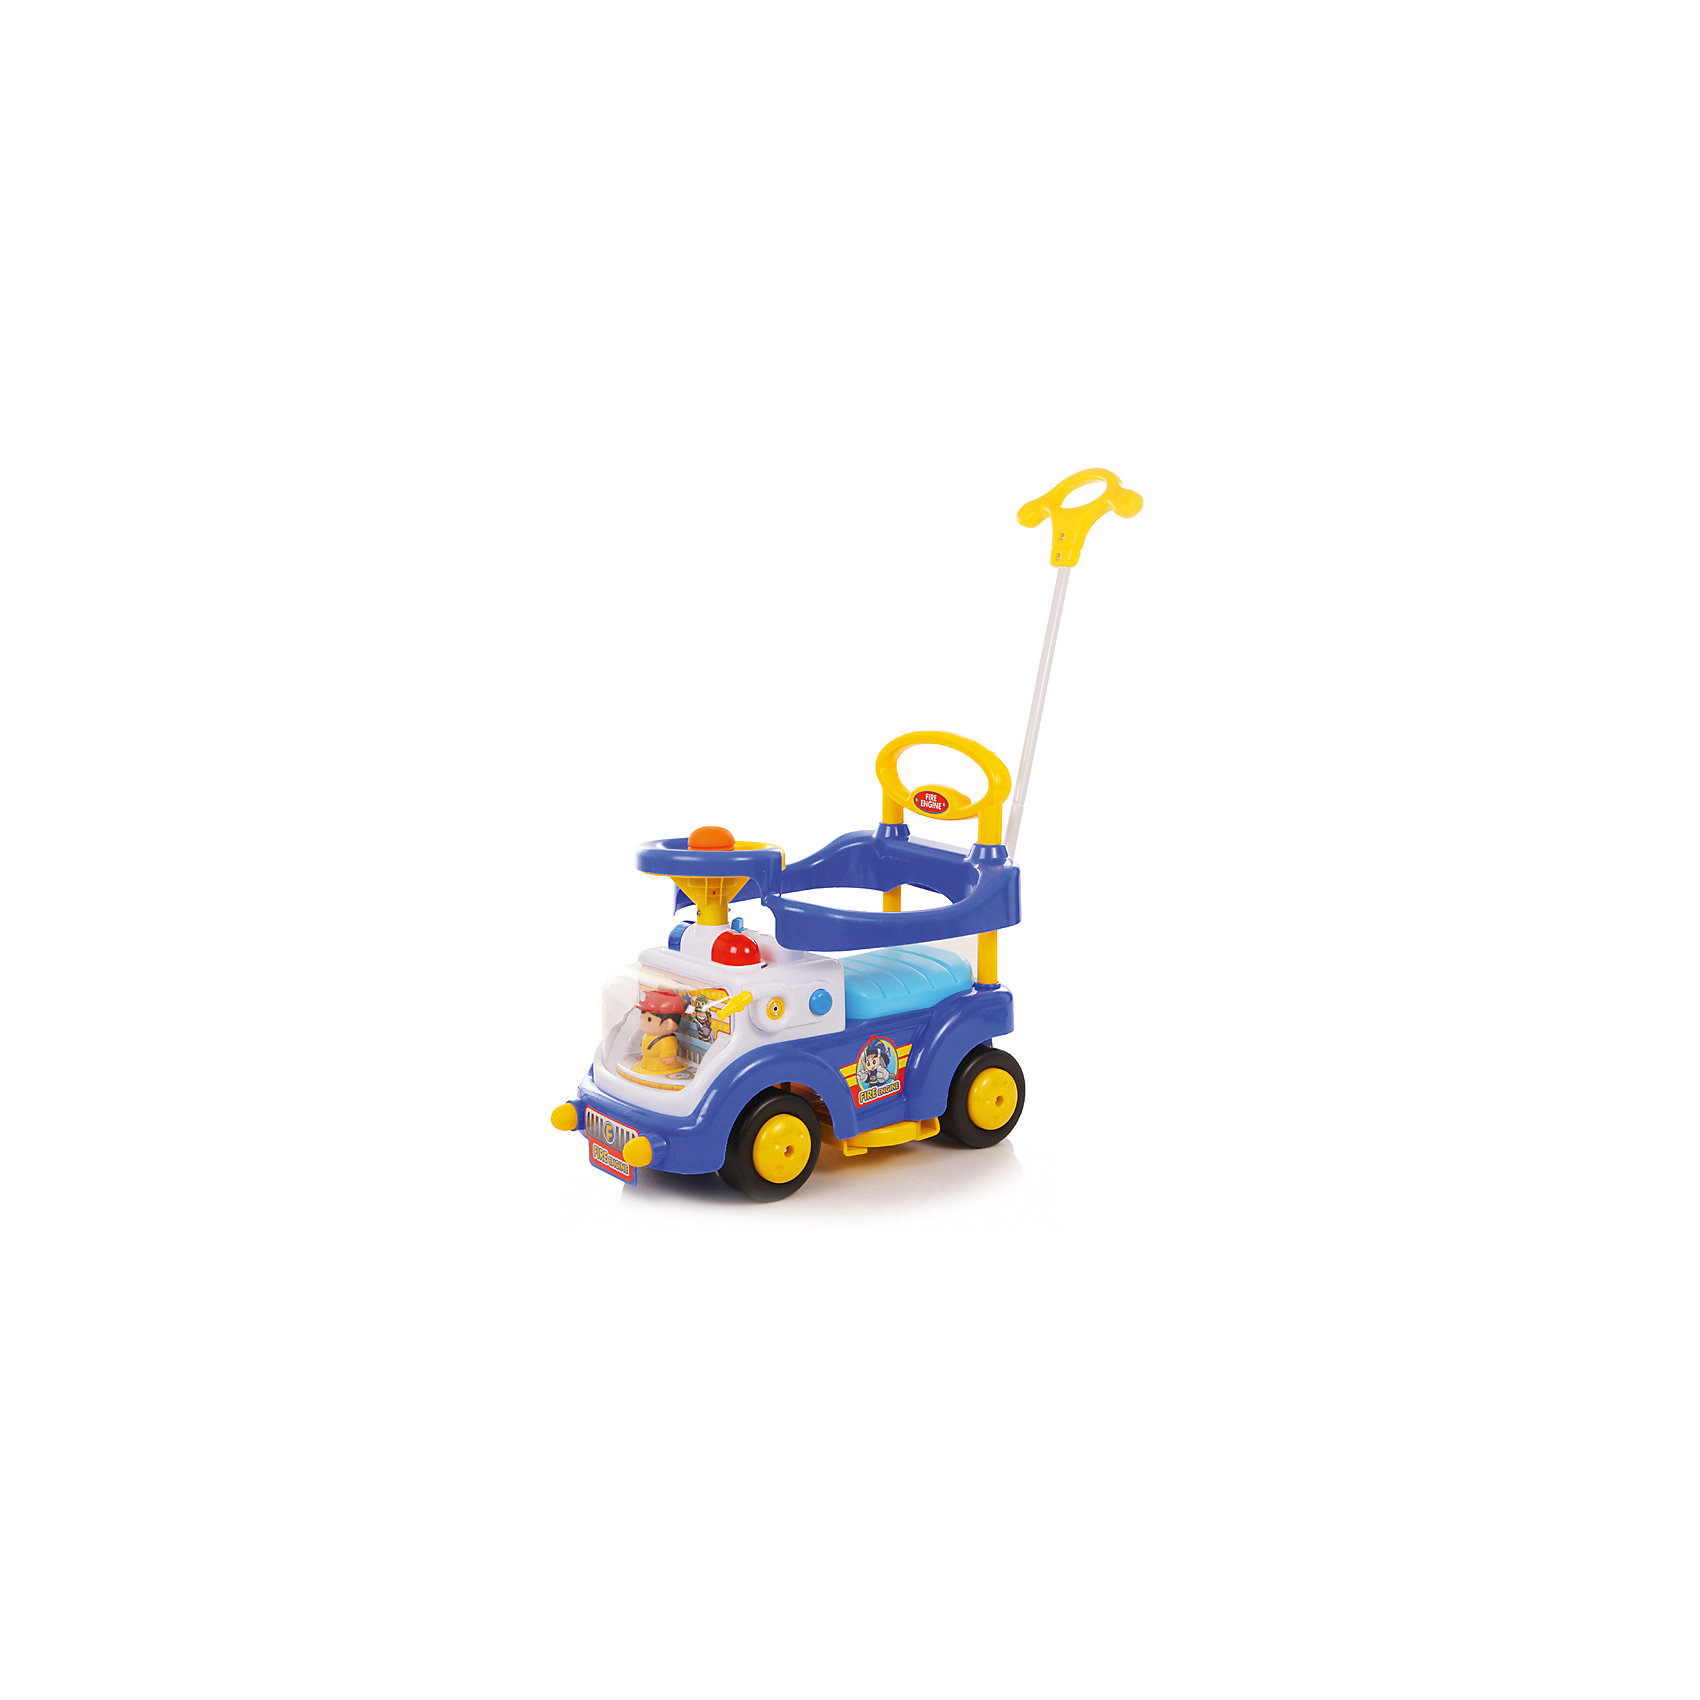 Каталка детская Fire Engine, синяя, Baby CareМашинки-каталки<br><br><br>Ширина мм: 670<br>Глубина мм: 390<br>Высота мм: 330<br>Вес г: 5400<br>Возраст от месяцев: 12<br>Возраст до месяцев: 36<br>Пол: Унисекс<br>Возраст: Детский<br>SKU: 5558852